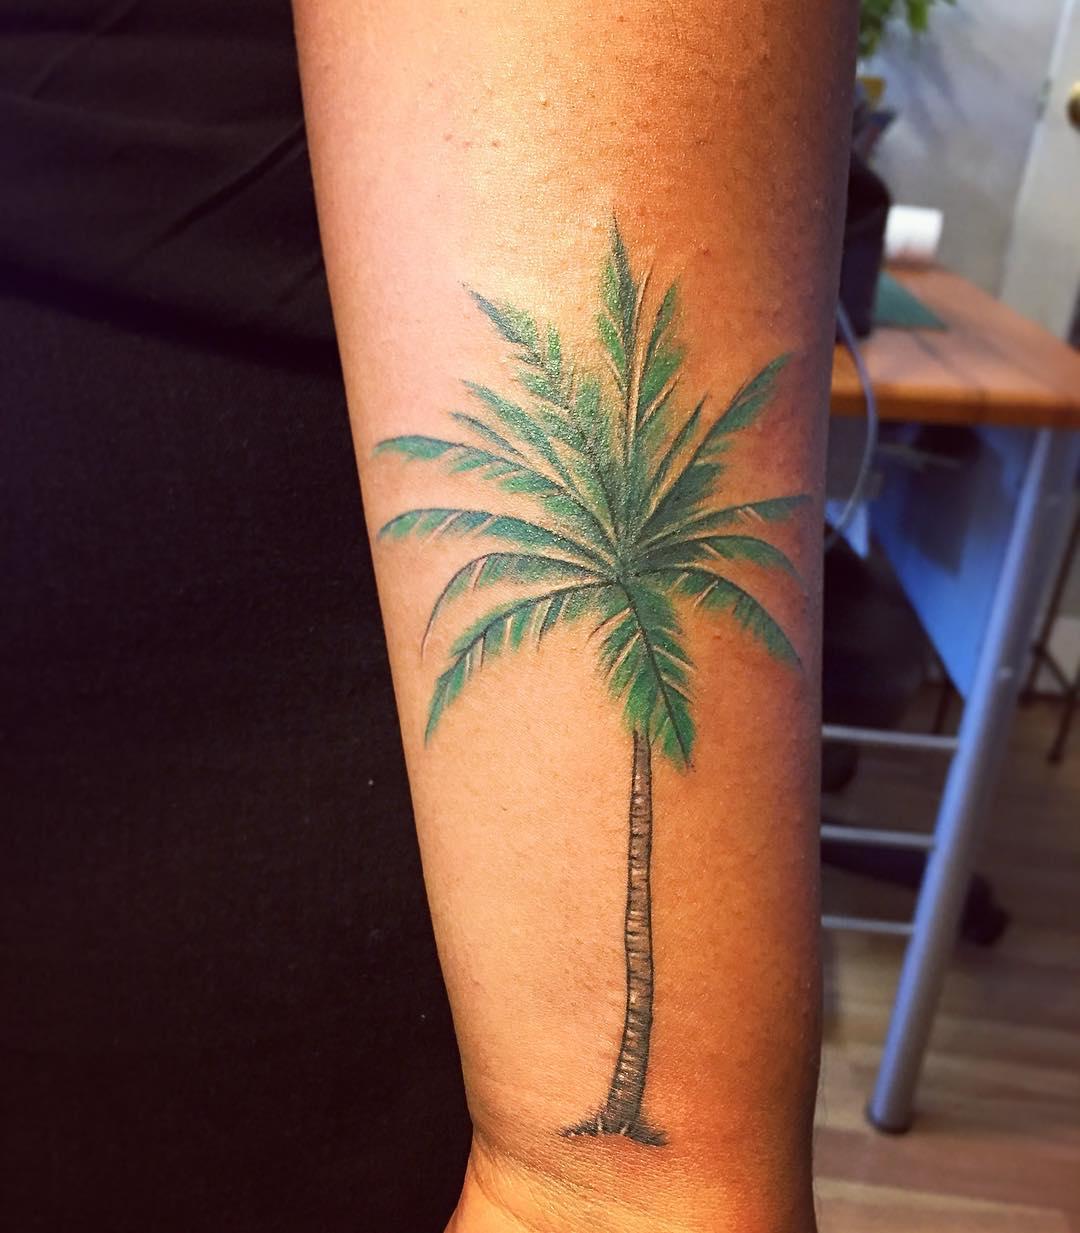 Cute_little_palm_tree_I_did_last_week__.jpg